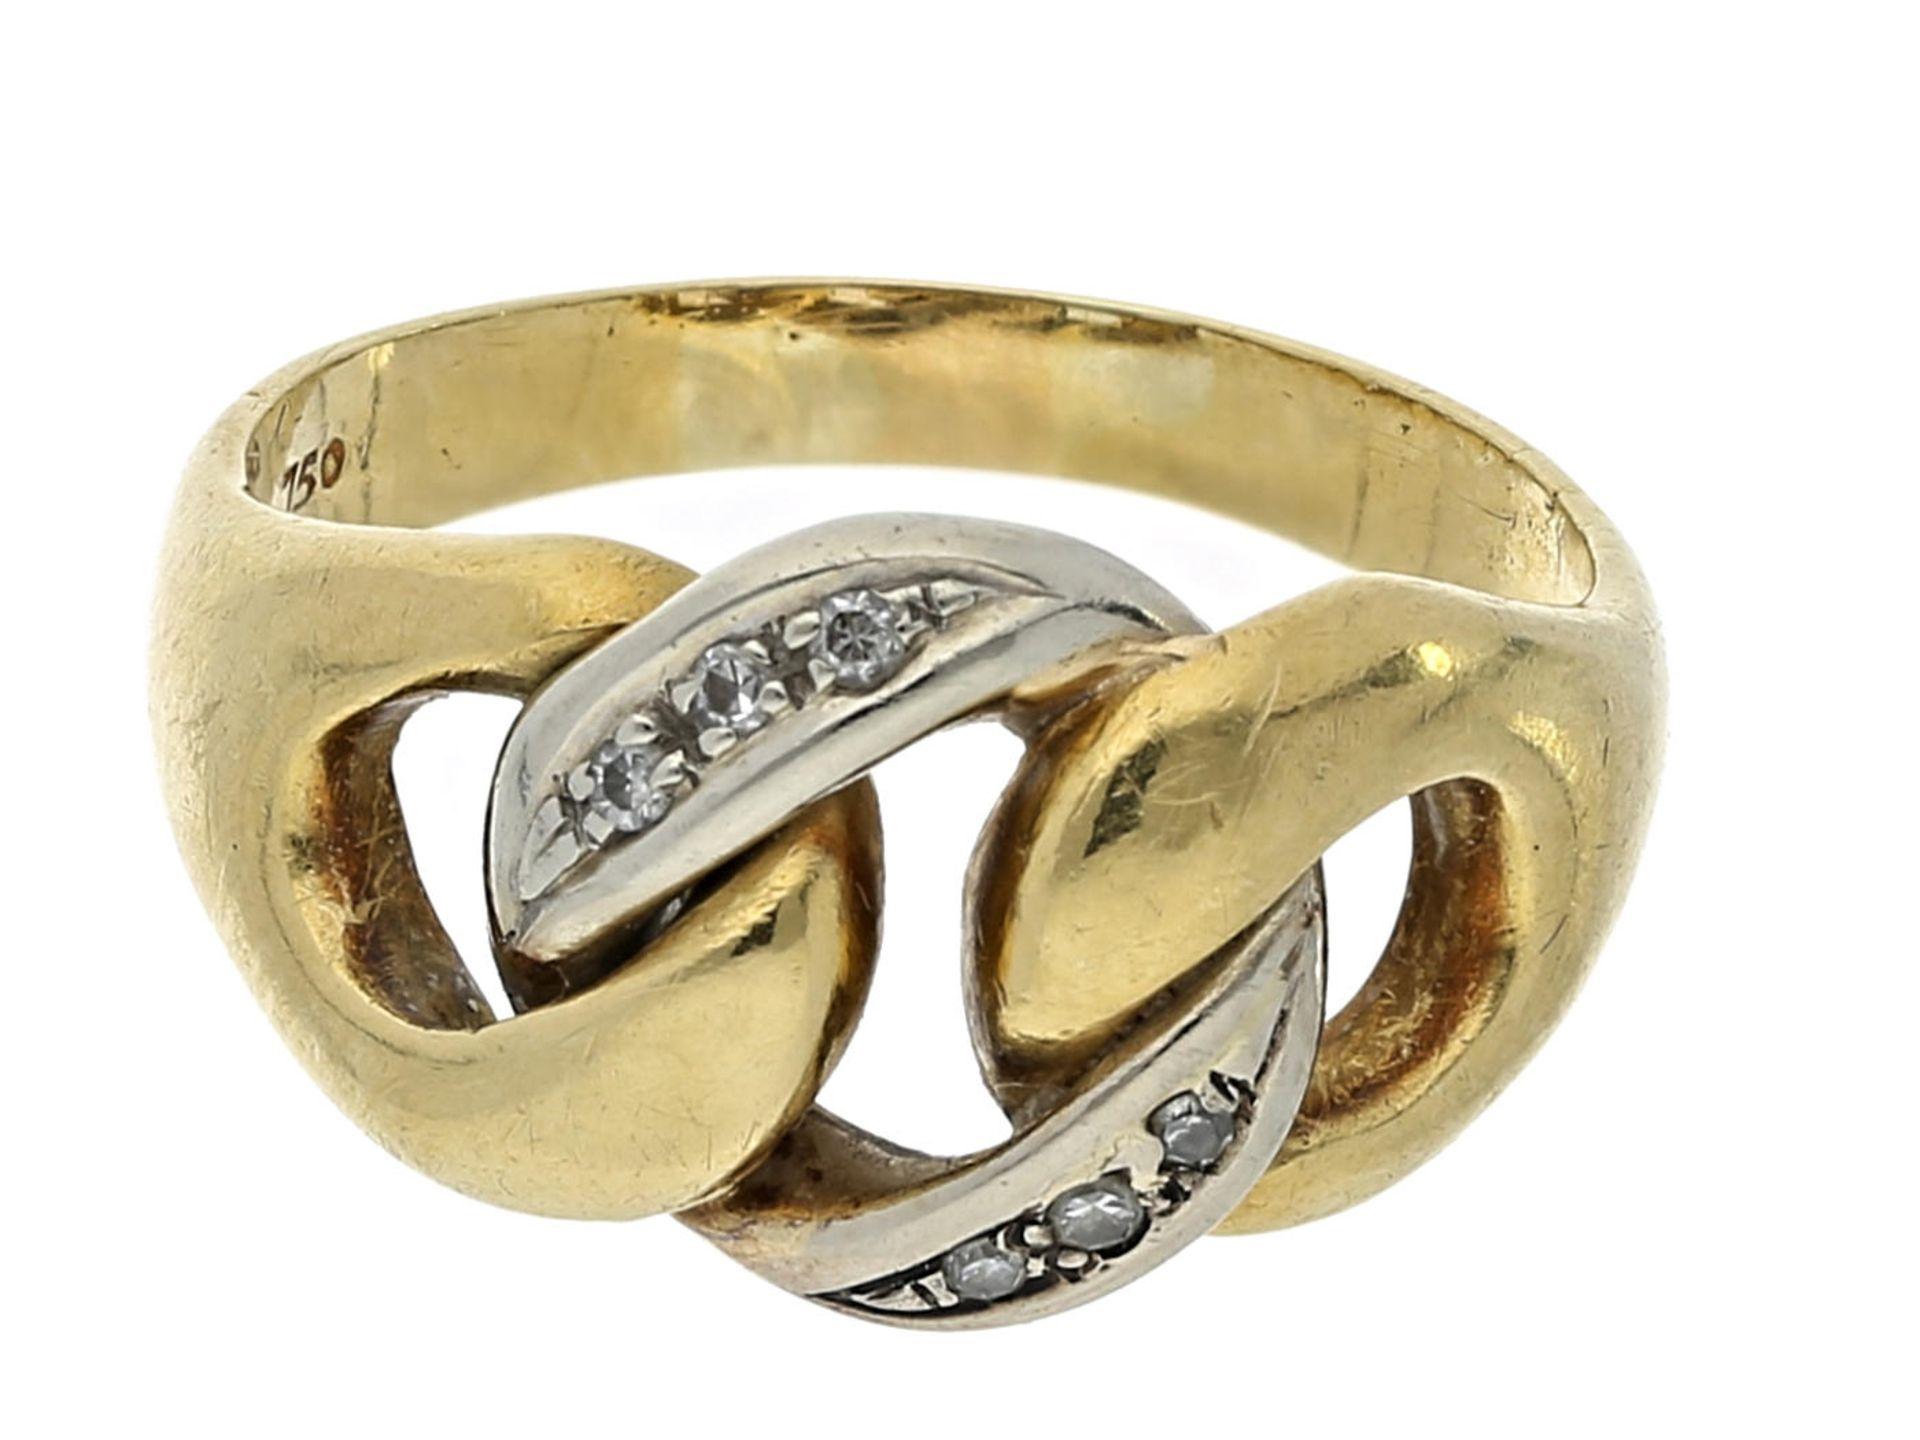 Los 6048 - Ring: vintage Diamantring, 50er Jahre Ca. Ø19,5mm, RG61, ca. 7,9g, 18K Gold, Diamantbesatz,